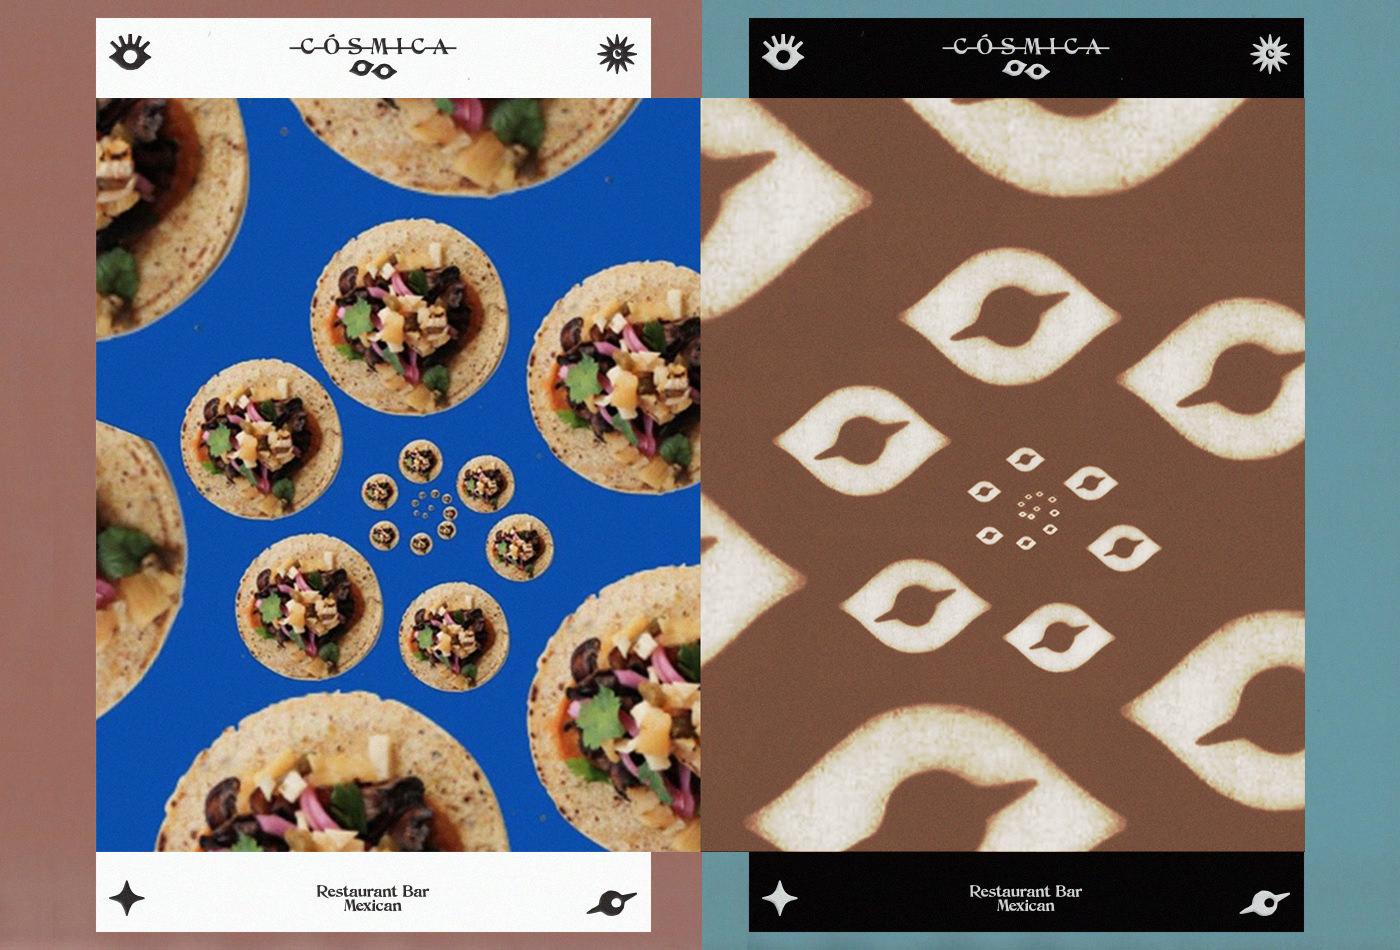 cosmica-cosmicaboston-boston-thebeehive-jackbardy-vacaliebres-branding-mexican-mexico-taco-tacos-cla-mex-logo-branding-identity-cal-mex-burrito-menus